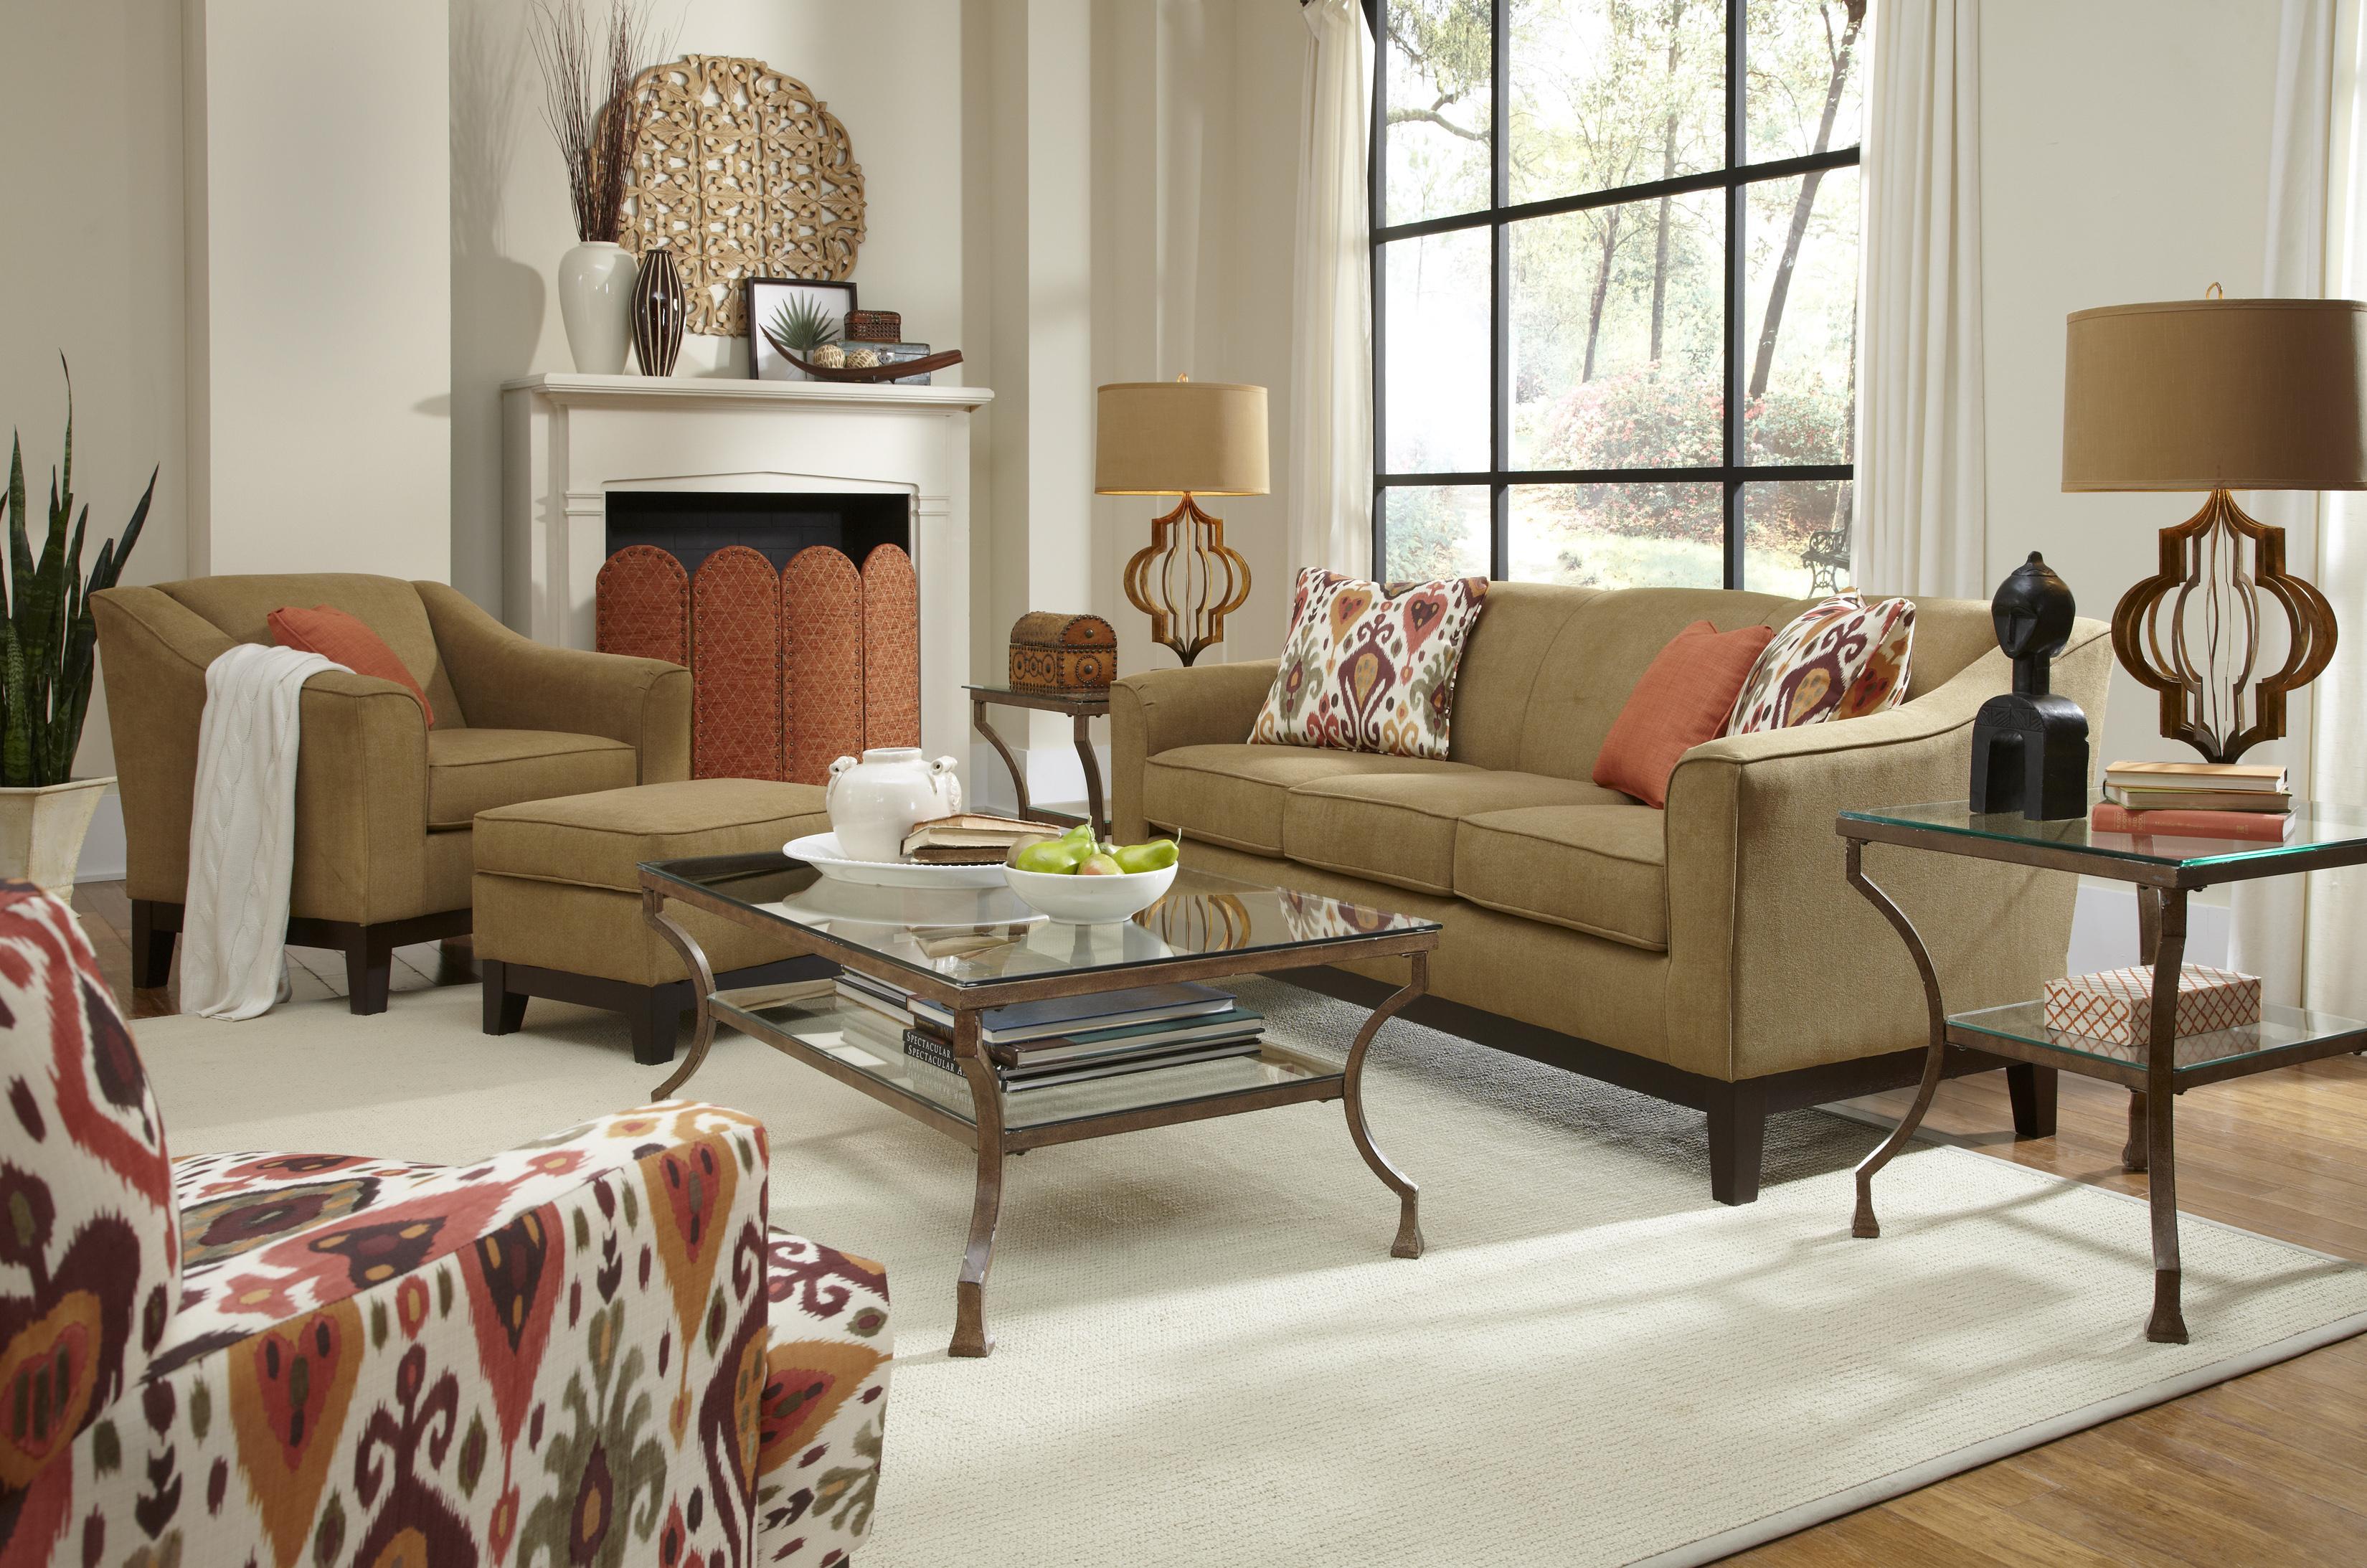 Best Home Furnishings. Anderson s Warehouse Furniture   Pittsburg  Herrin  IL